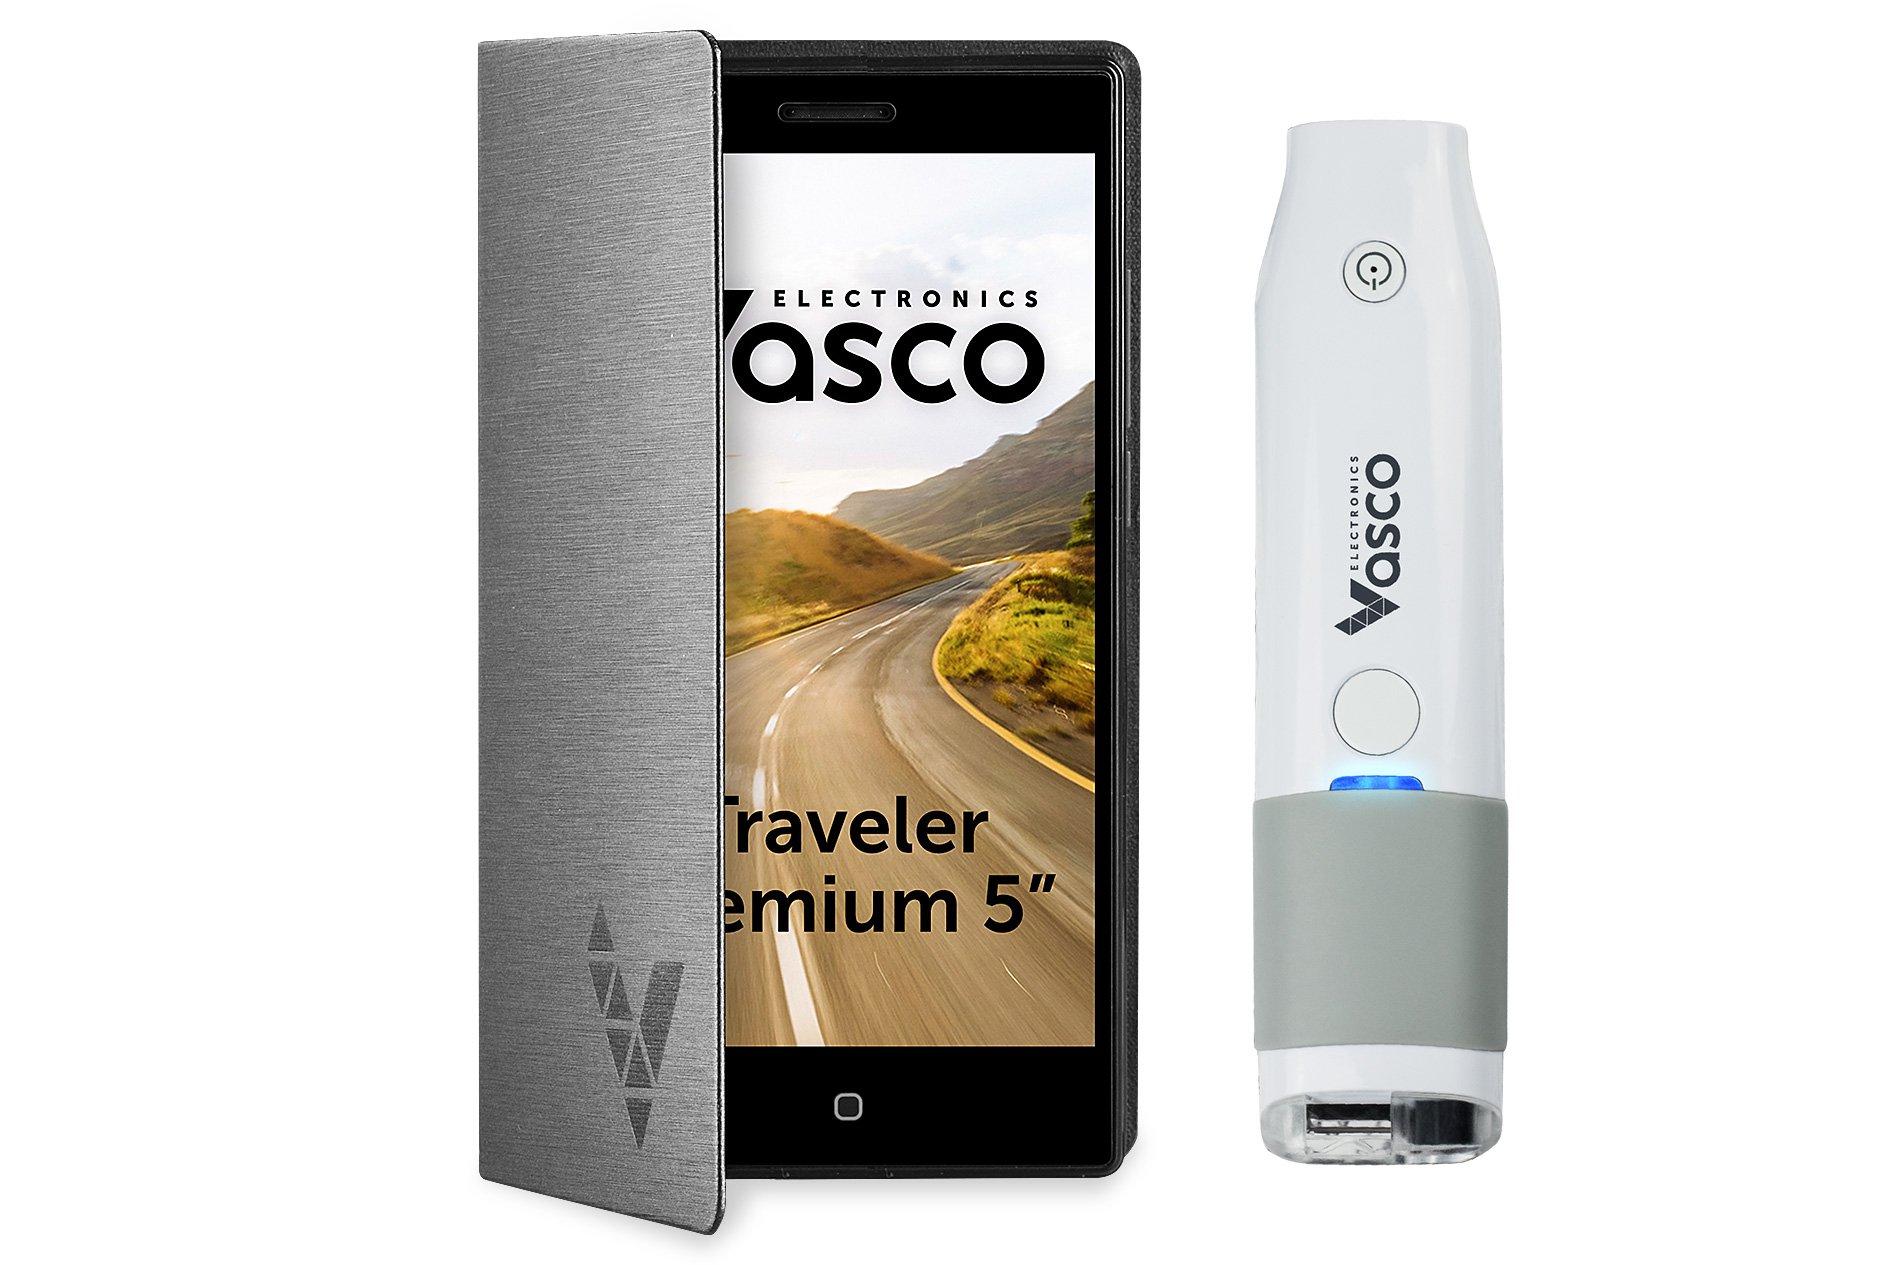 Vasco Traveler Premium 5'' + Scanner: Voice Translator with Handheld Scanner, GPS, Travel Phone, Guide and more!